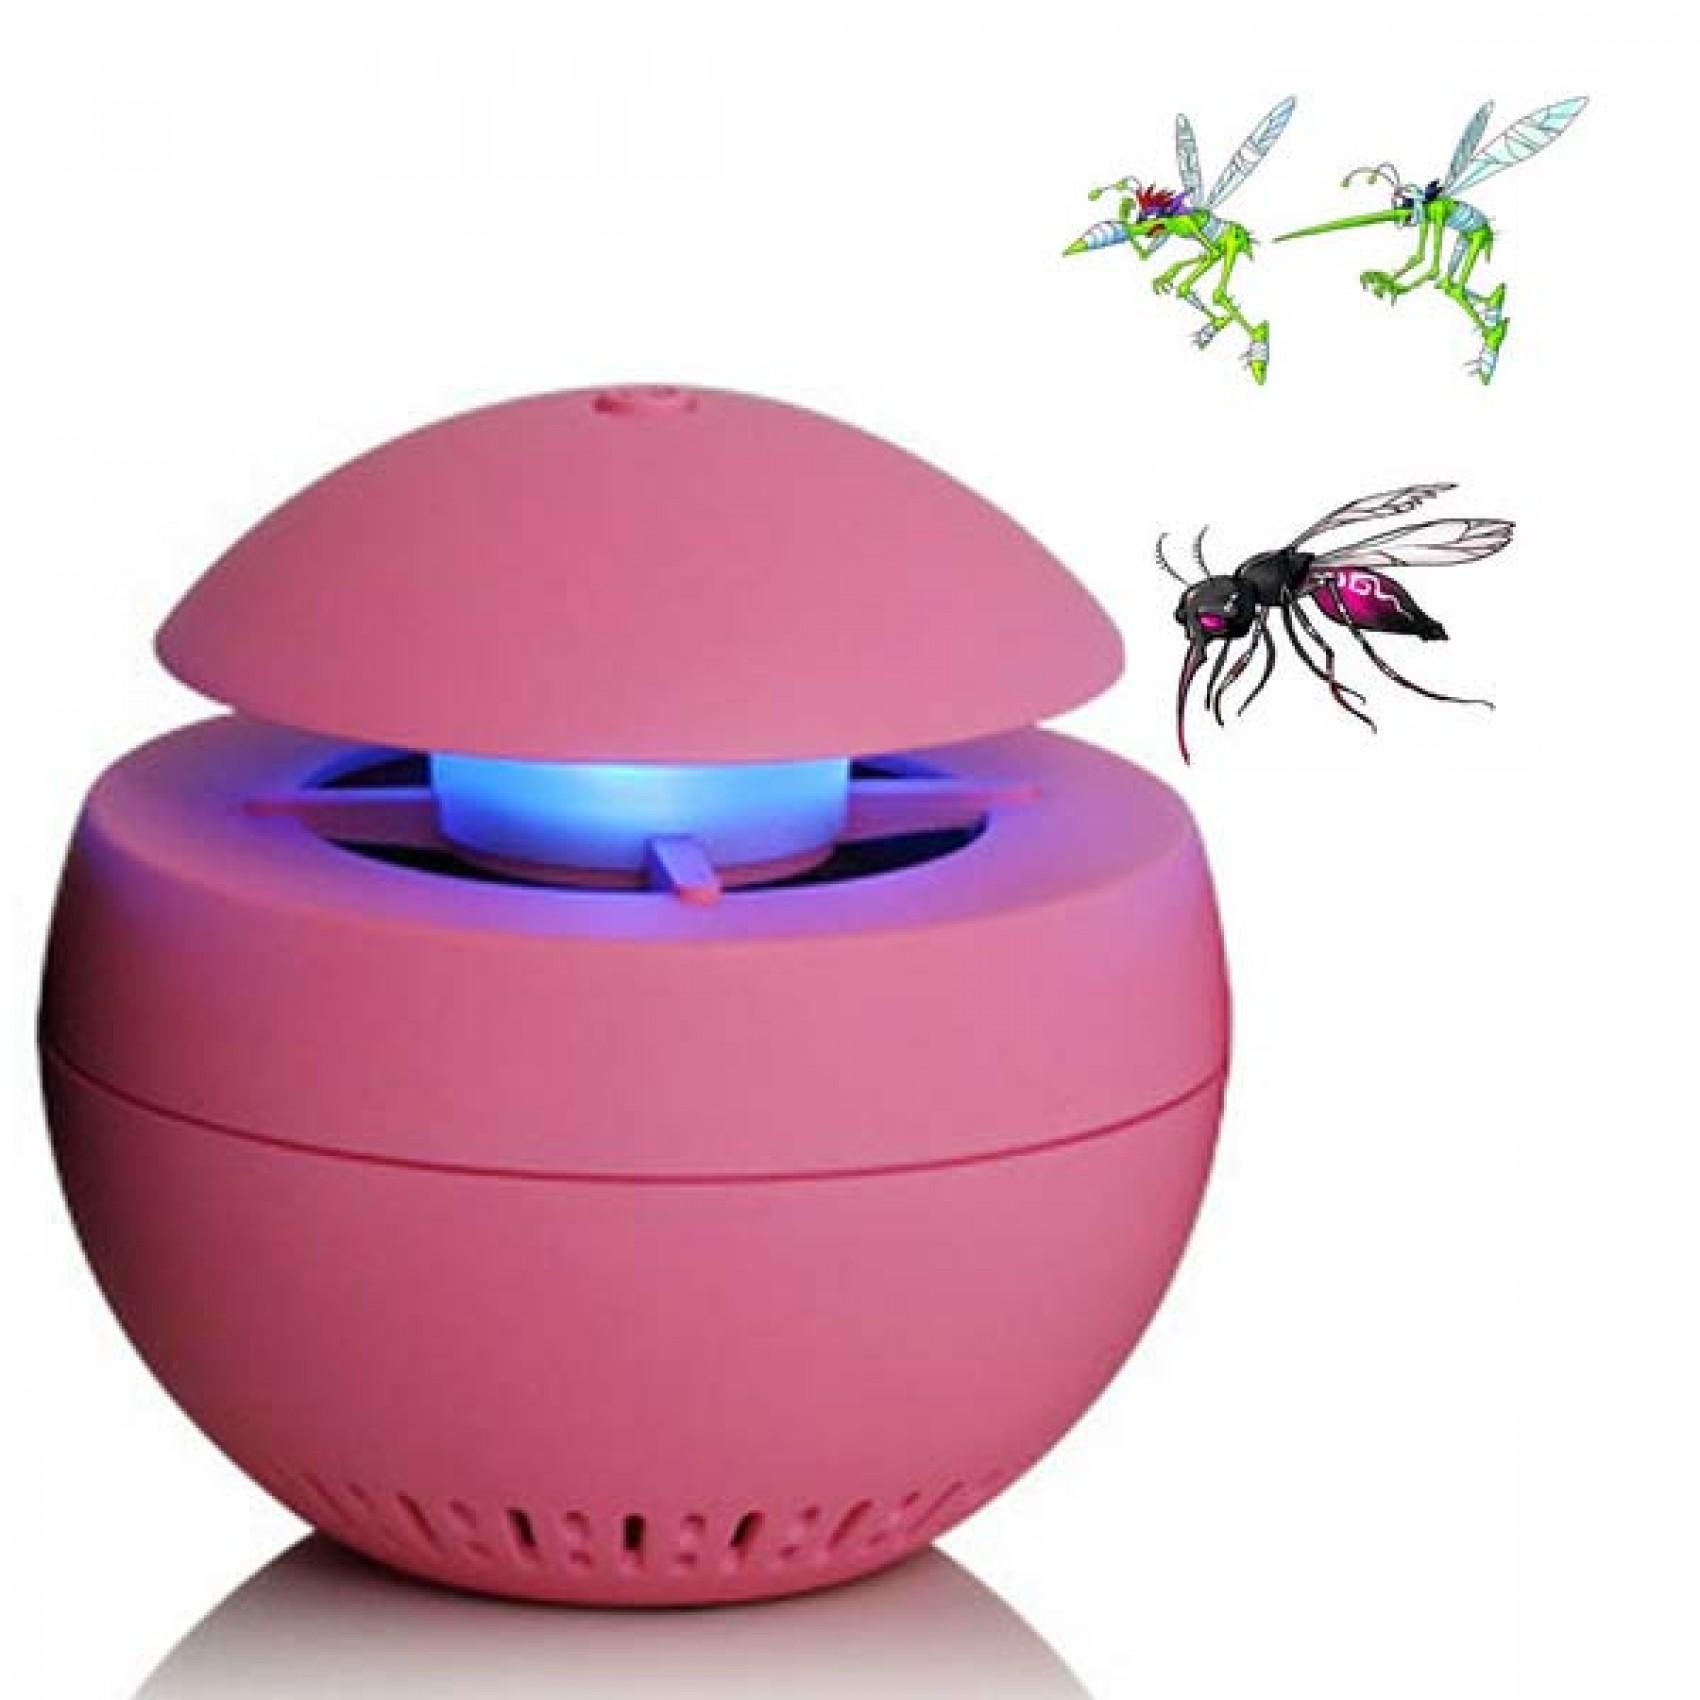 Mosquito Killer Led Night Light Aroma - Pink